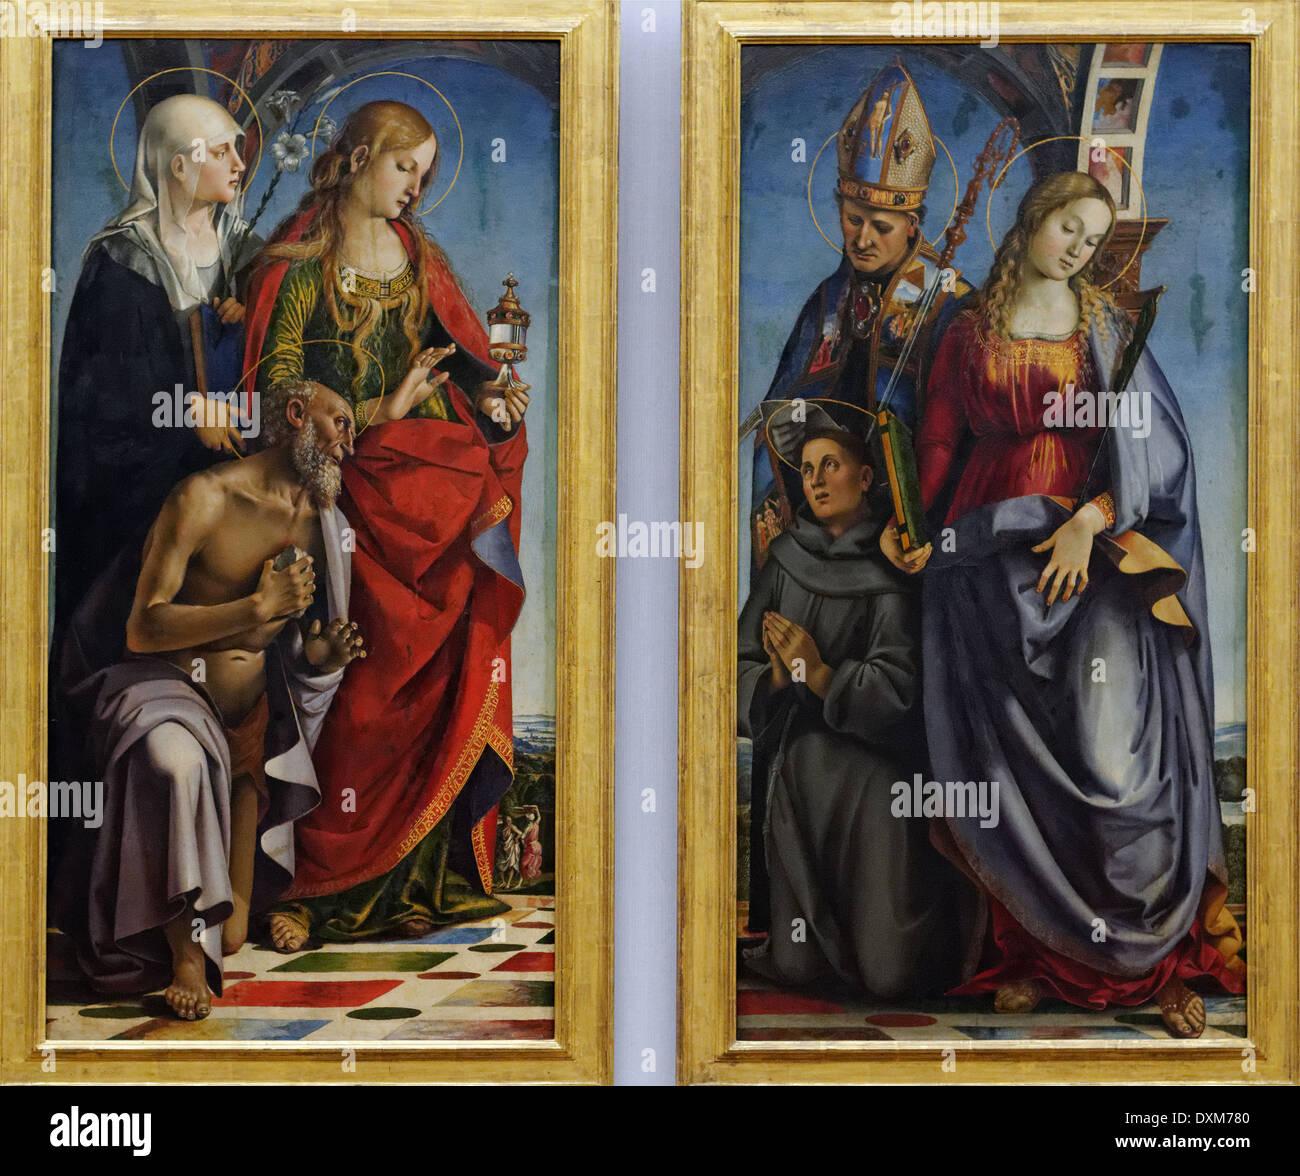 Luca Signorelli - Dos paneles laterales del altar de planta de la capilla de S. Agastino Bichi en Sienna - 1491 - Siglo XV - Italiano Imagen De Stock